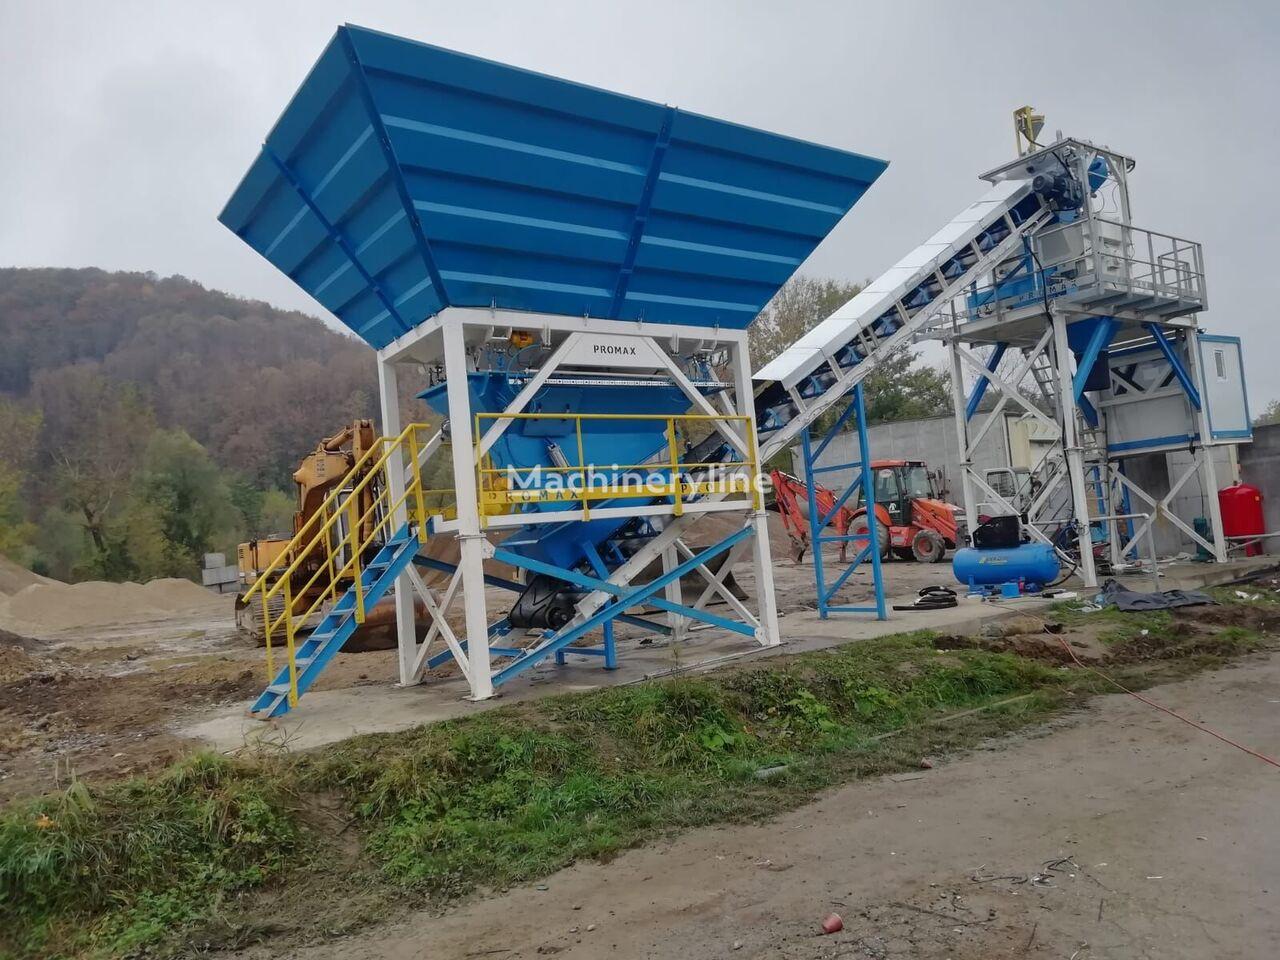 нов бетонов възел PROMAX Compact Concrete Batching Plant C60-SNG-PLUS (60m3/h)